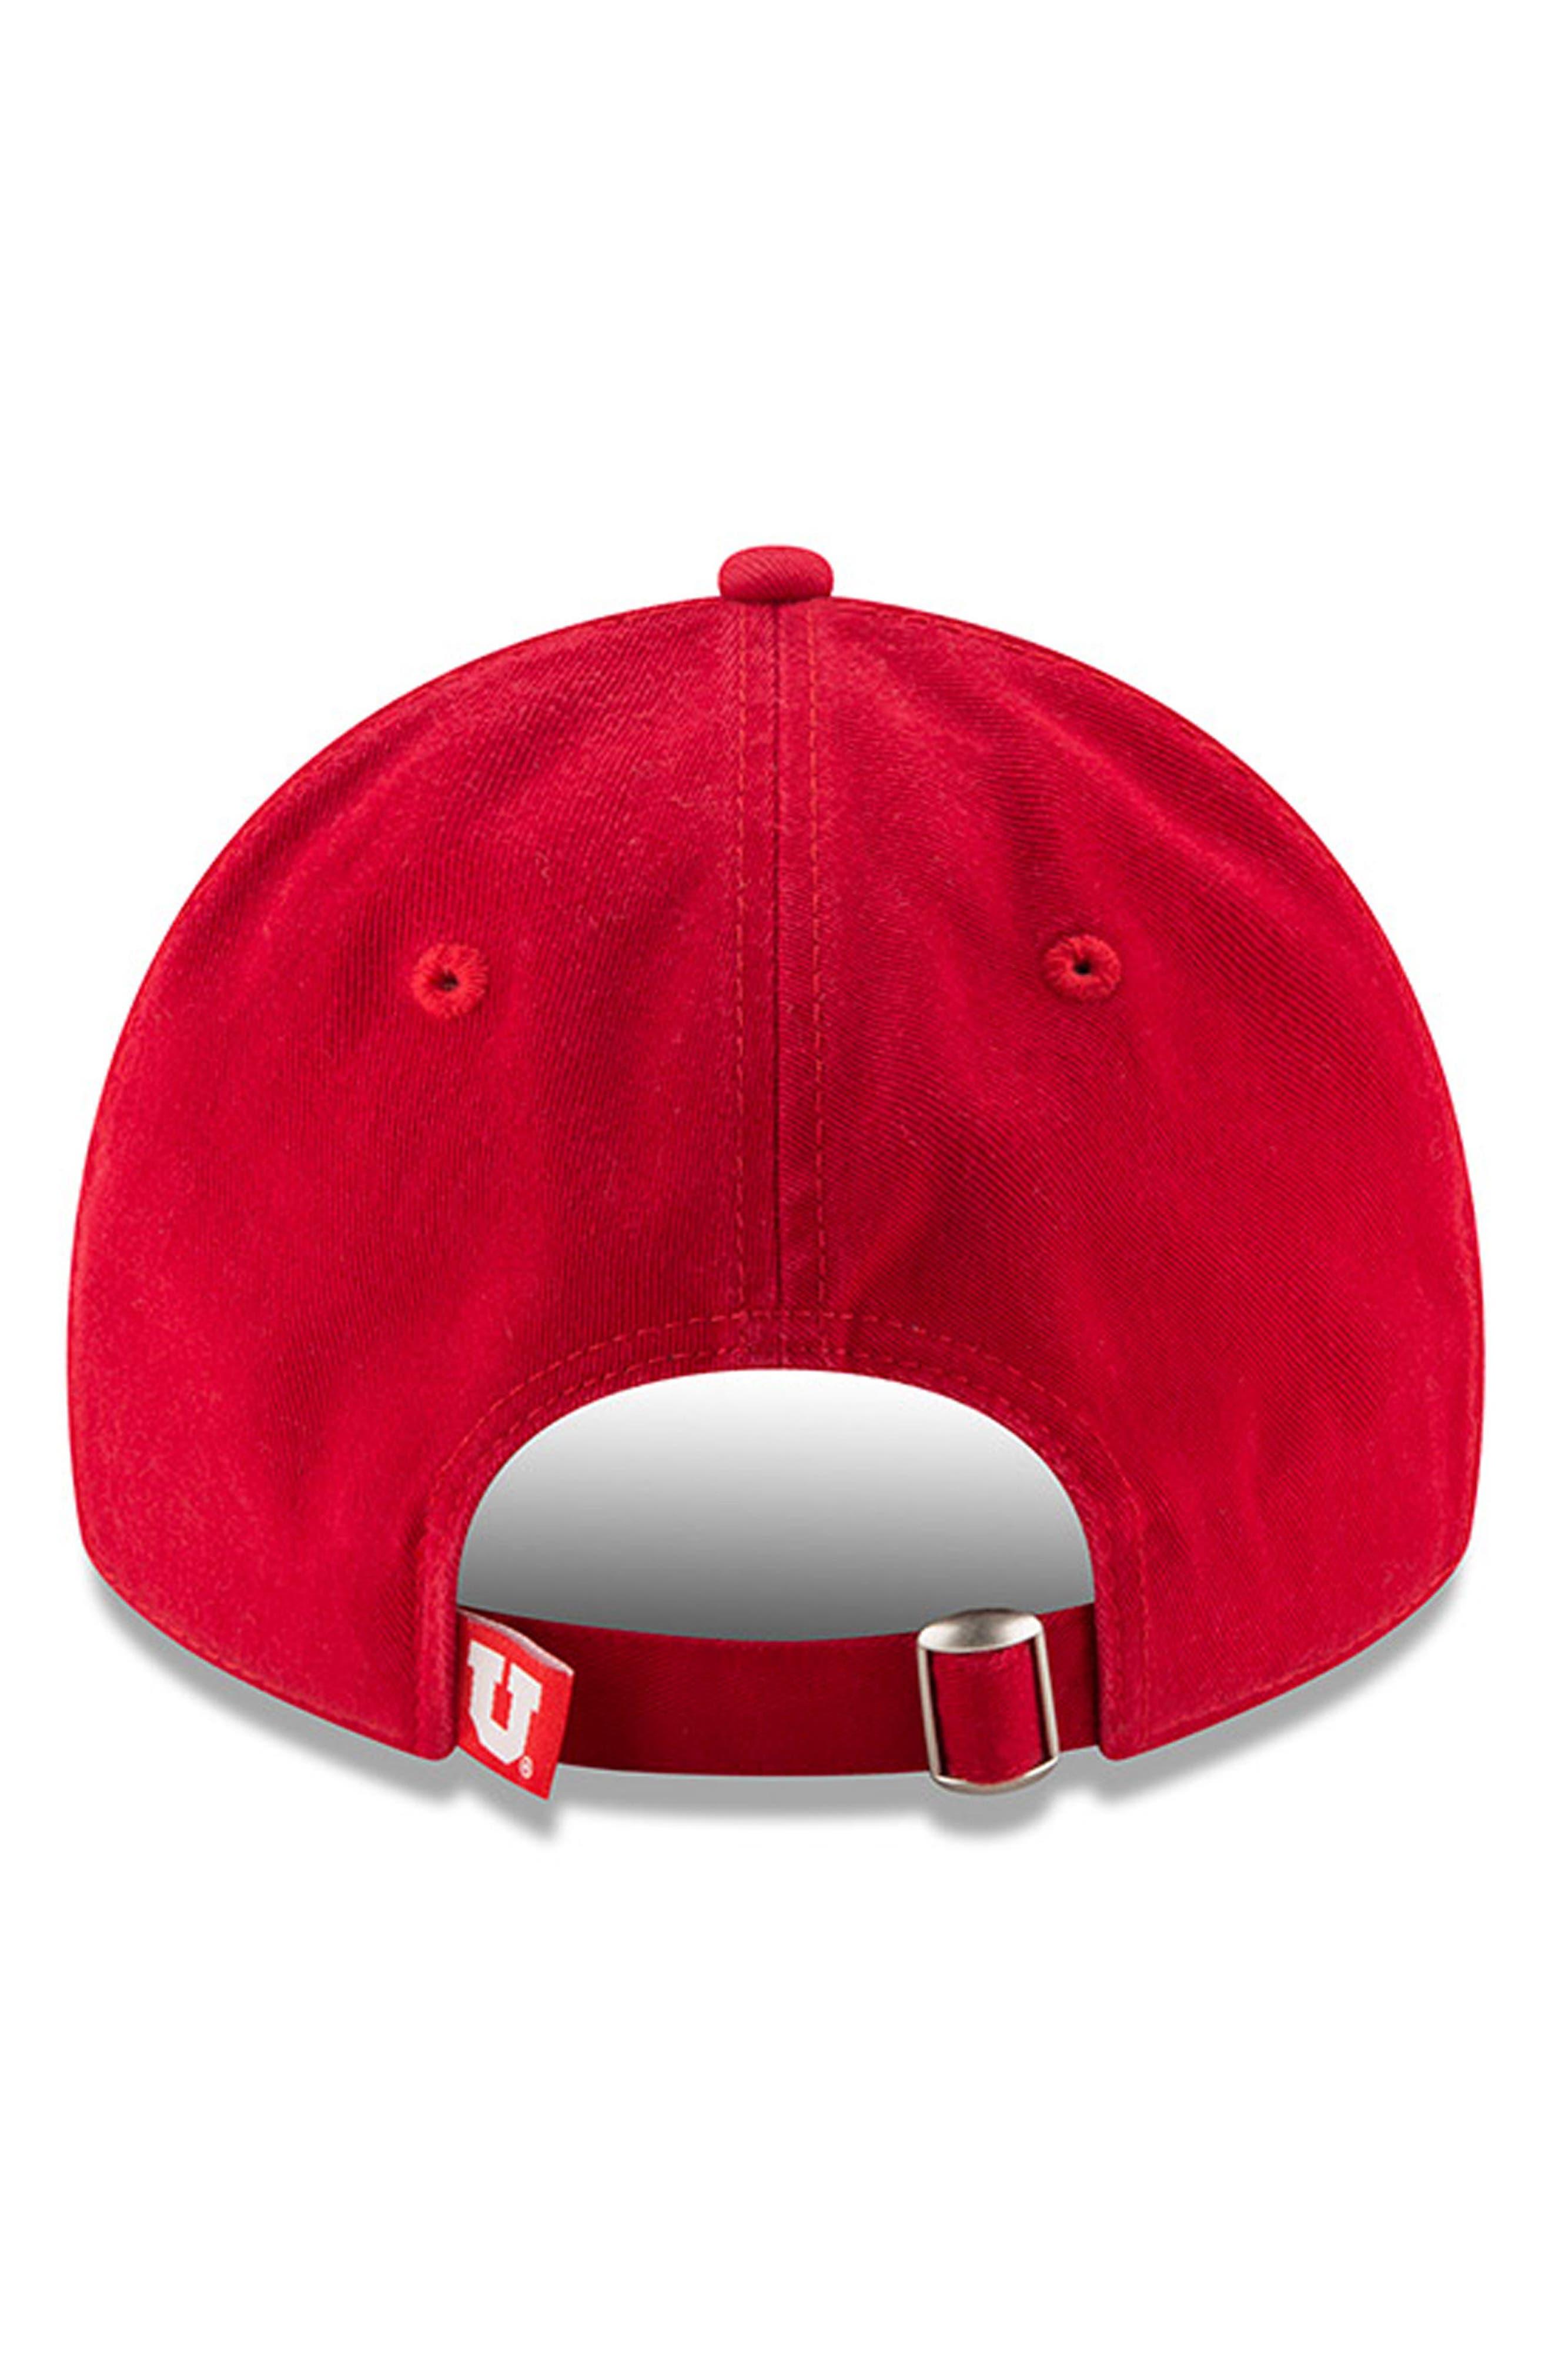 New Era Collegiate Core Classic - Utah Utes Baseball Cap,                             Alternate thumbnail 3, color,                             600